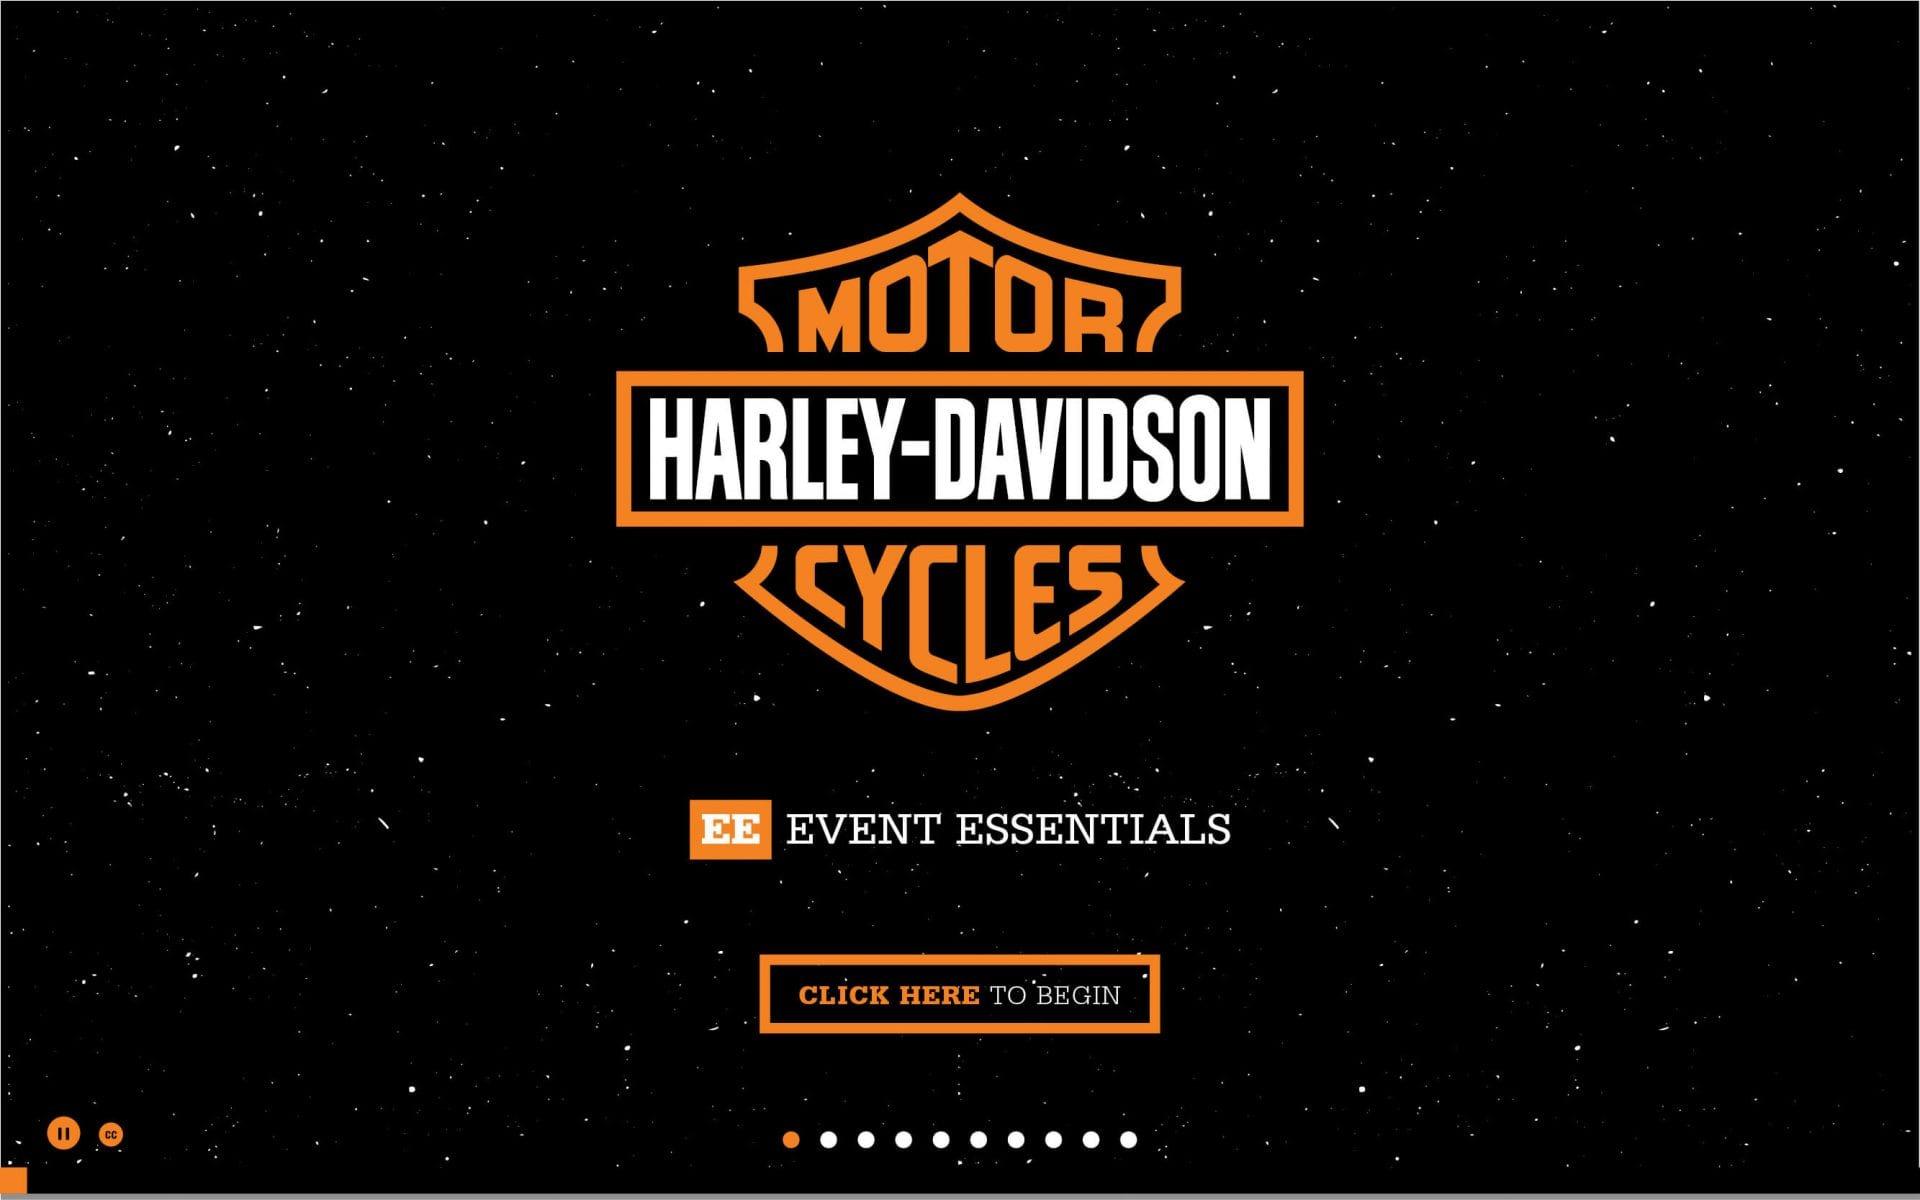 Harley Davidson Motor Cycles_Mechanics_eModule-Intro